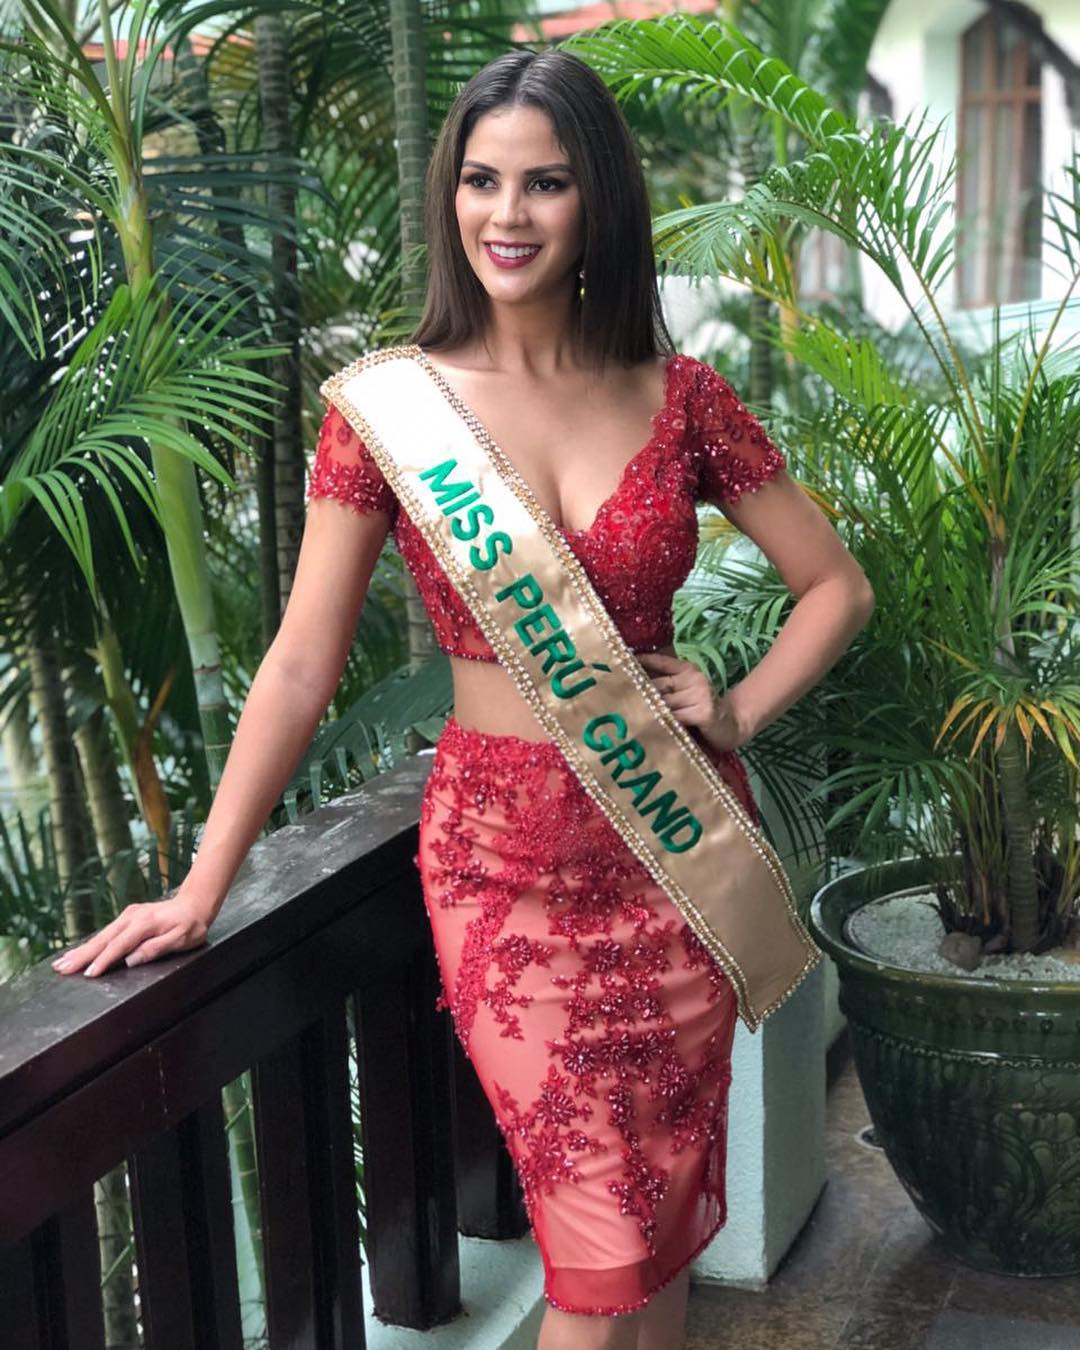 andrea moberg, top 20 de miss grand international 2018 (best national costume). - Página 4 42384210